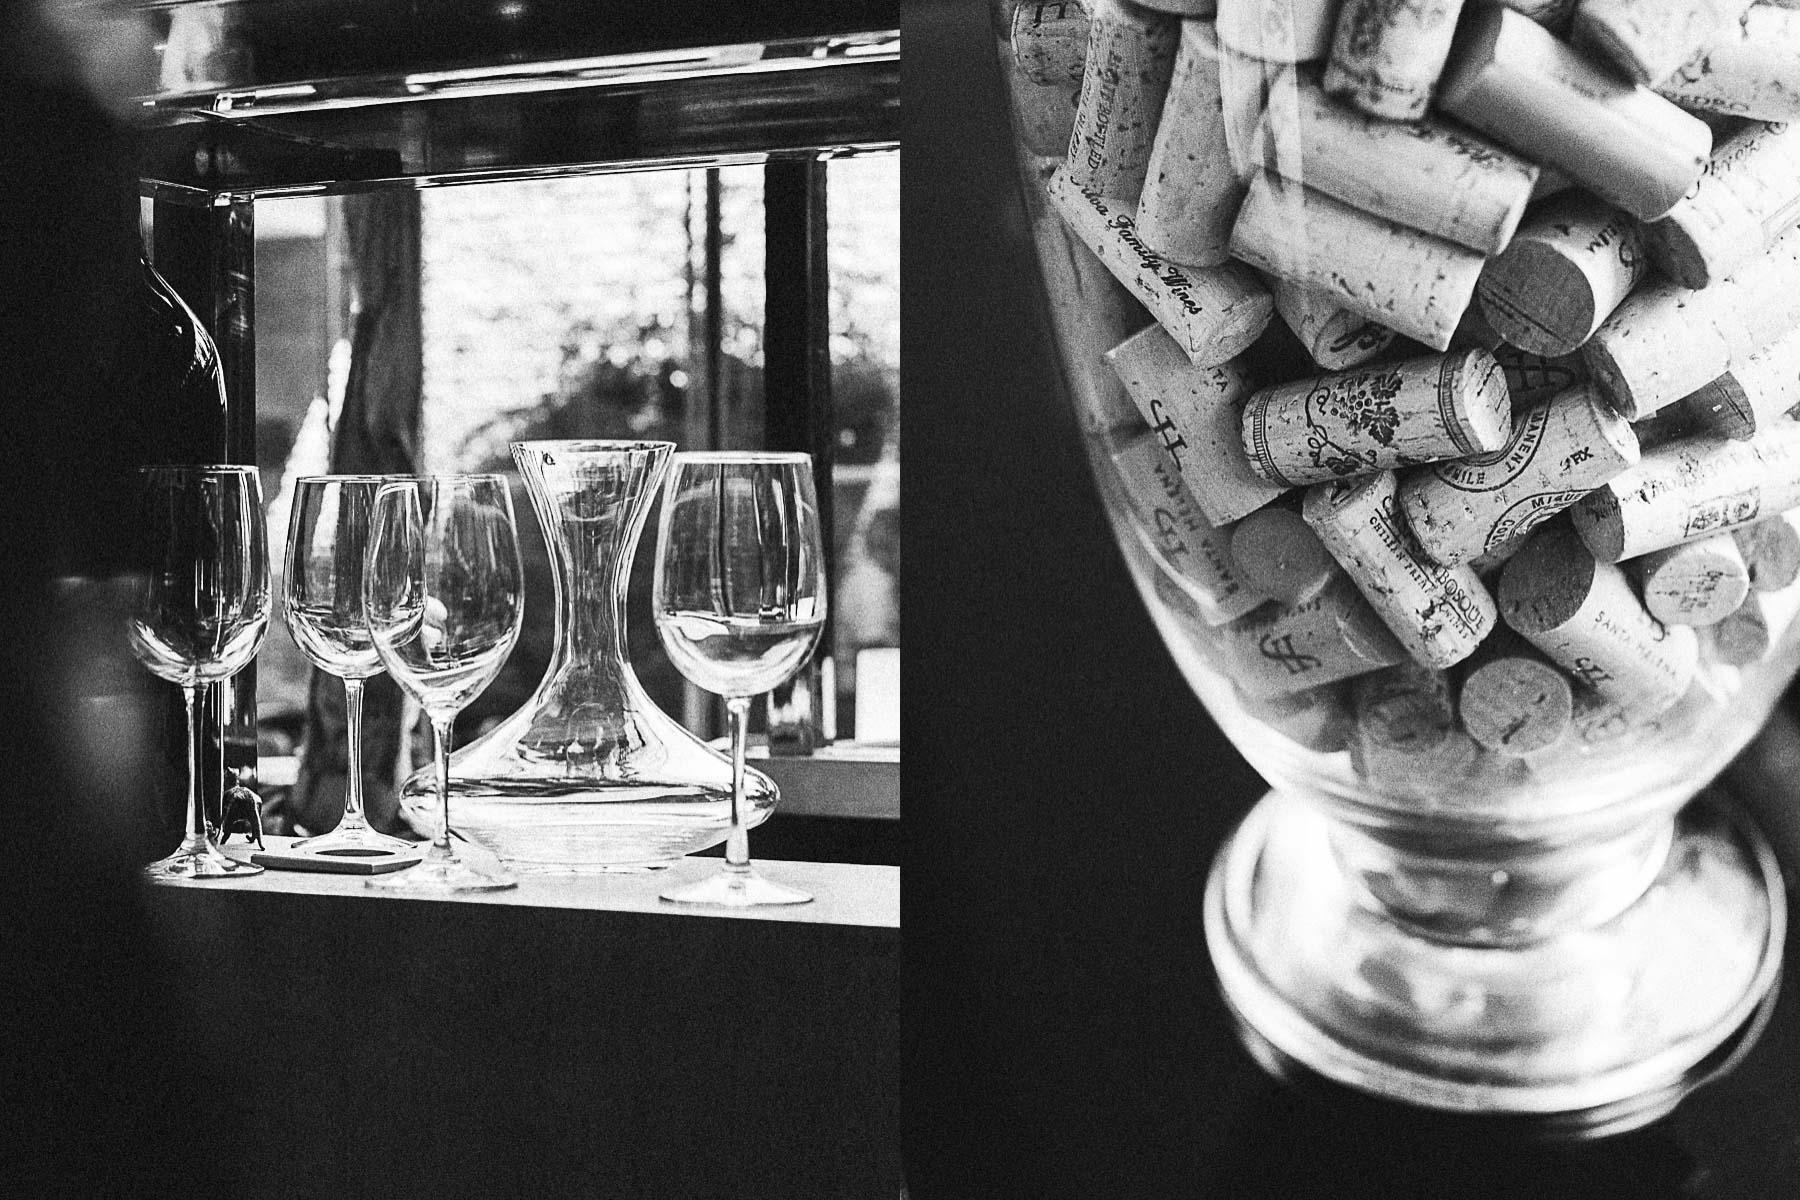 bistro-km-0-luxury-dining-santiago-chile-02.jpg